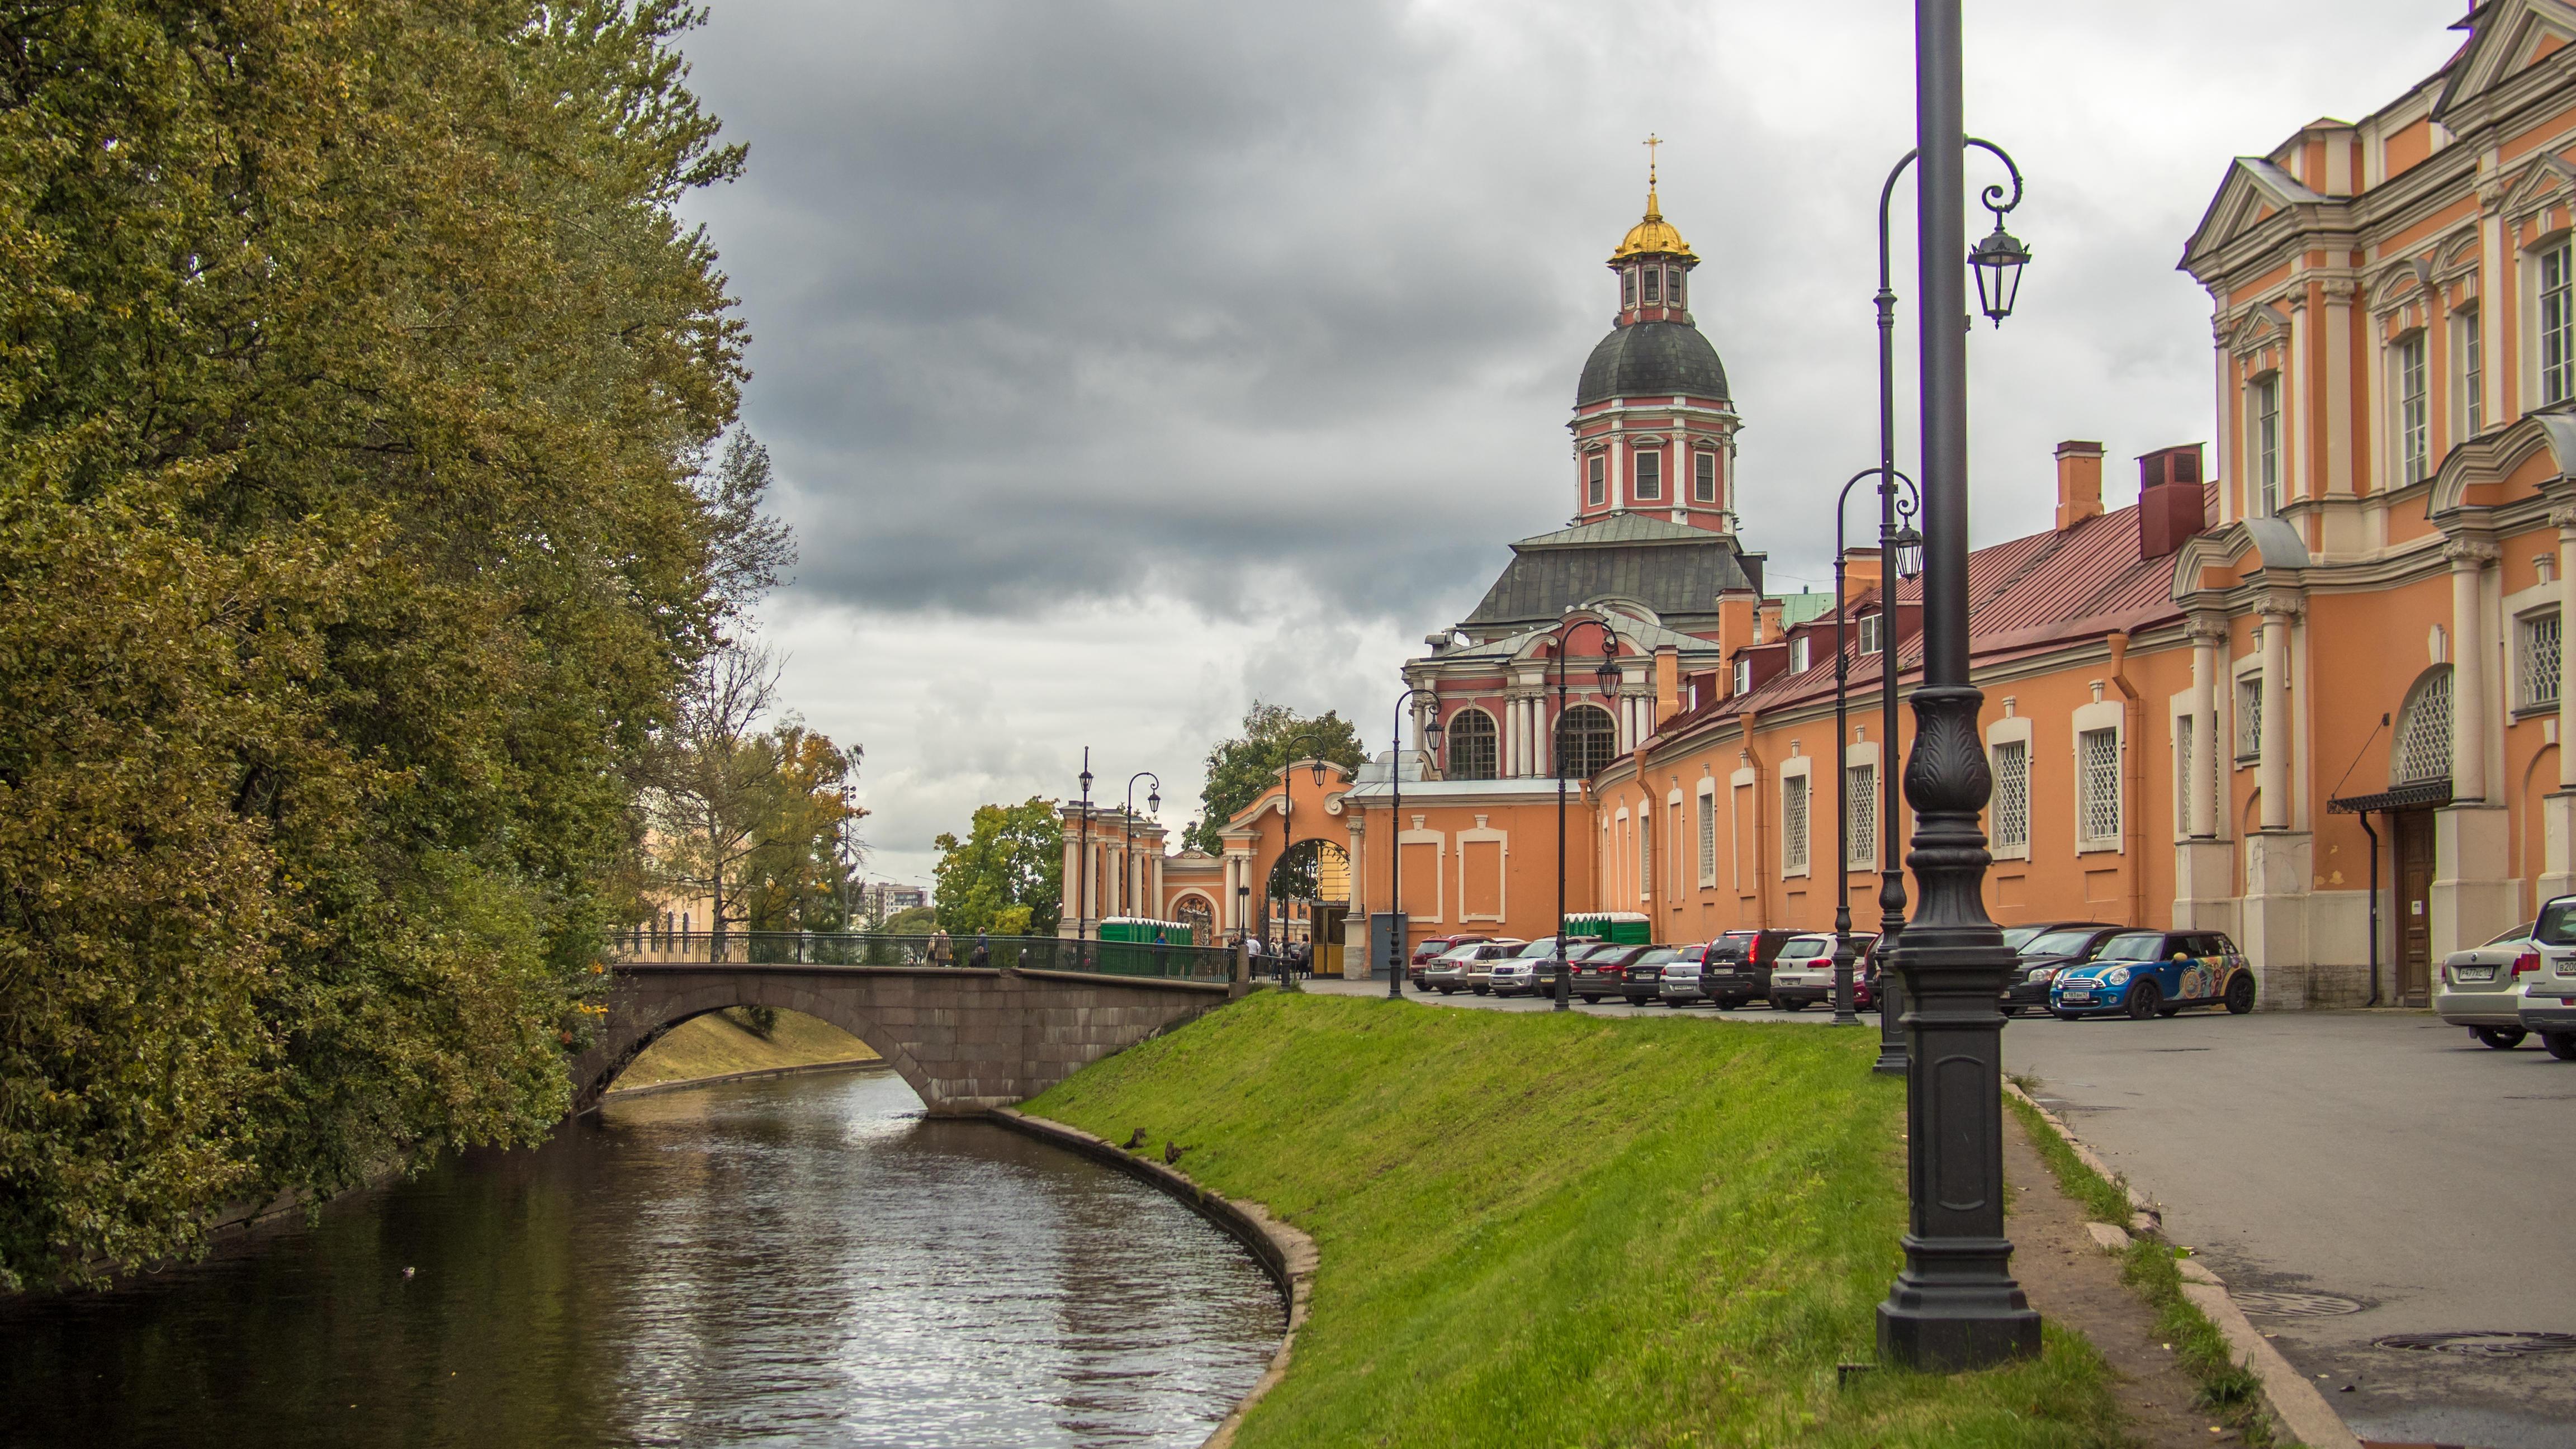 обои Saint Alexander Nevsky Lavra, St Petersburg картинки фото